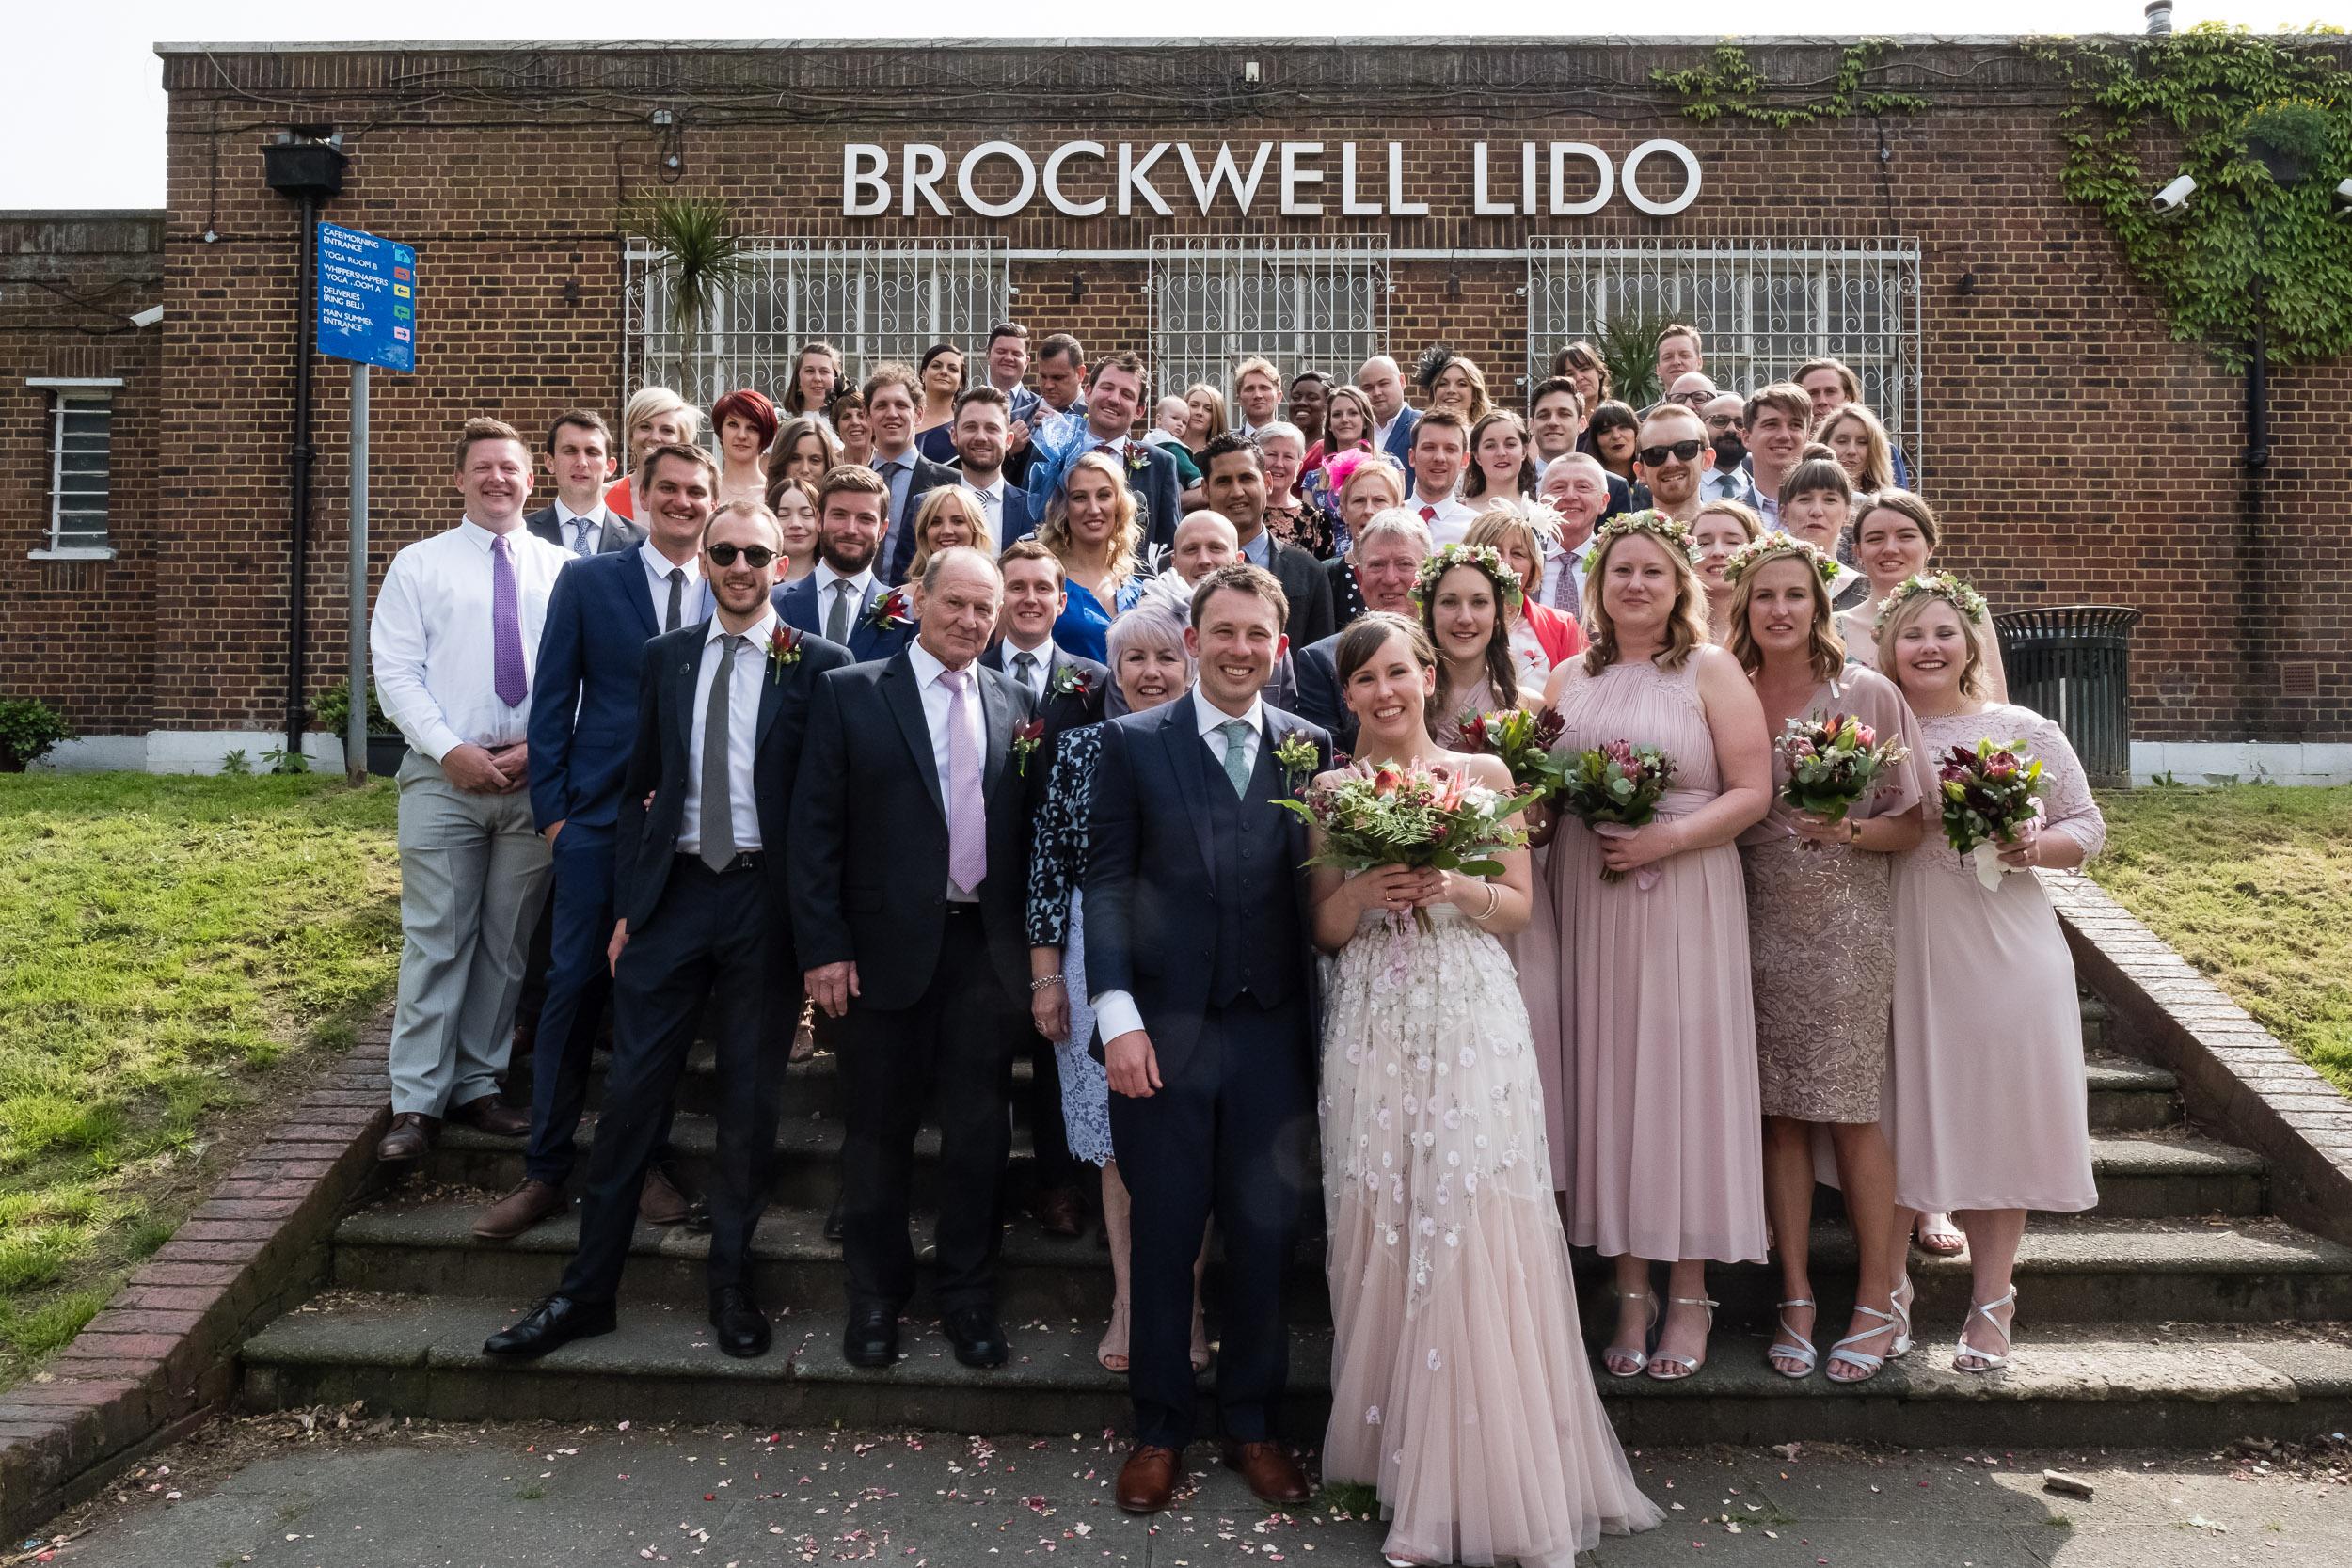 brockwell-lido-brixton-herne-hill-wedding-223.jpg